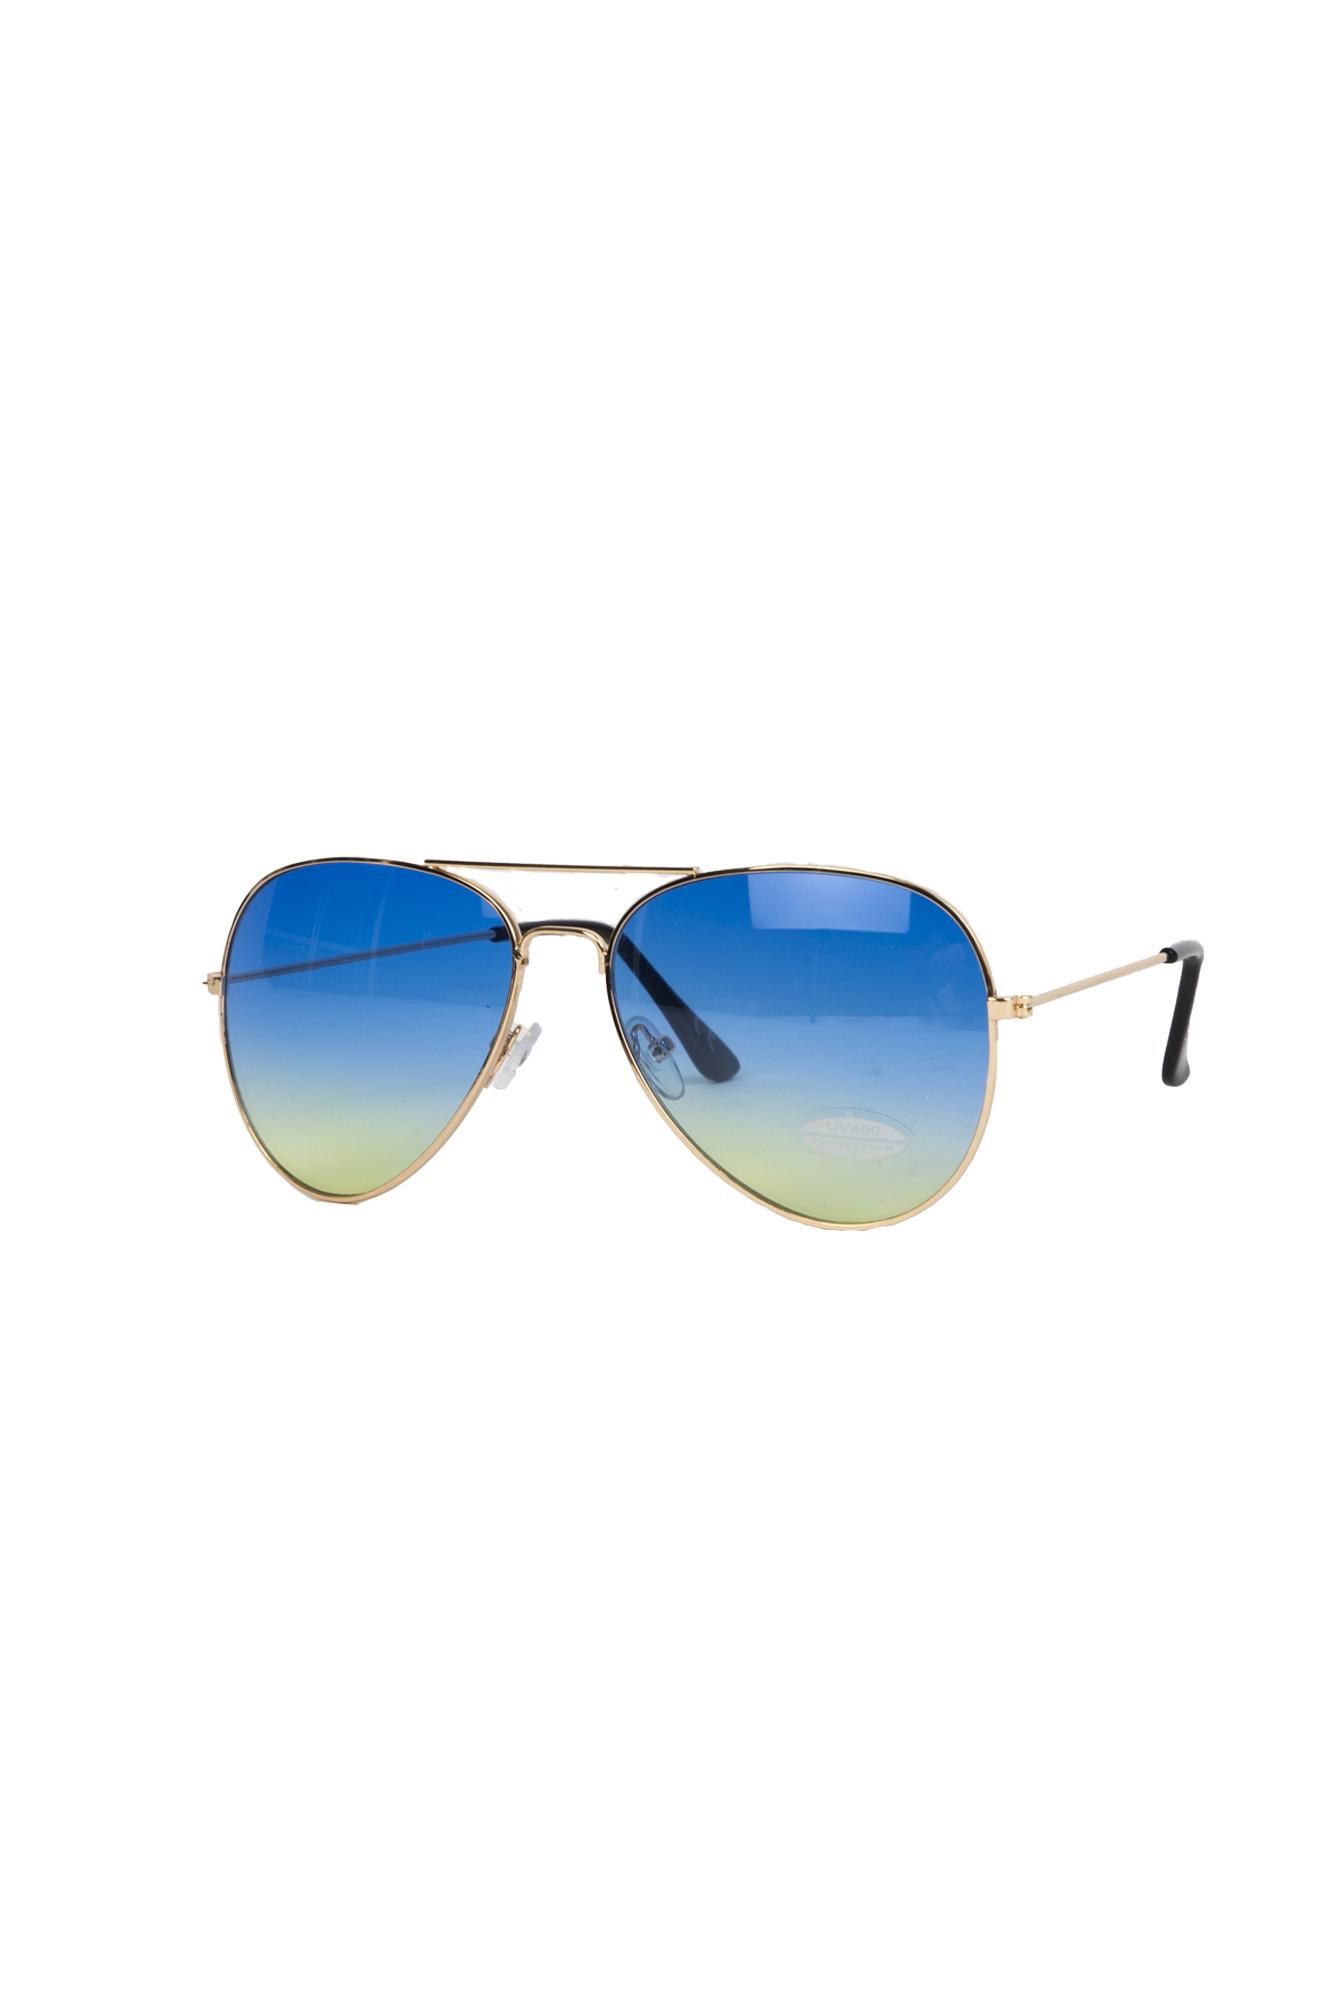 Zonnebril Jill blauw-geel